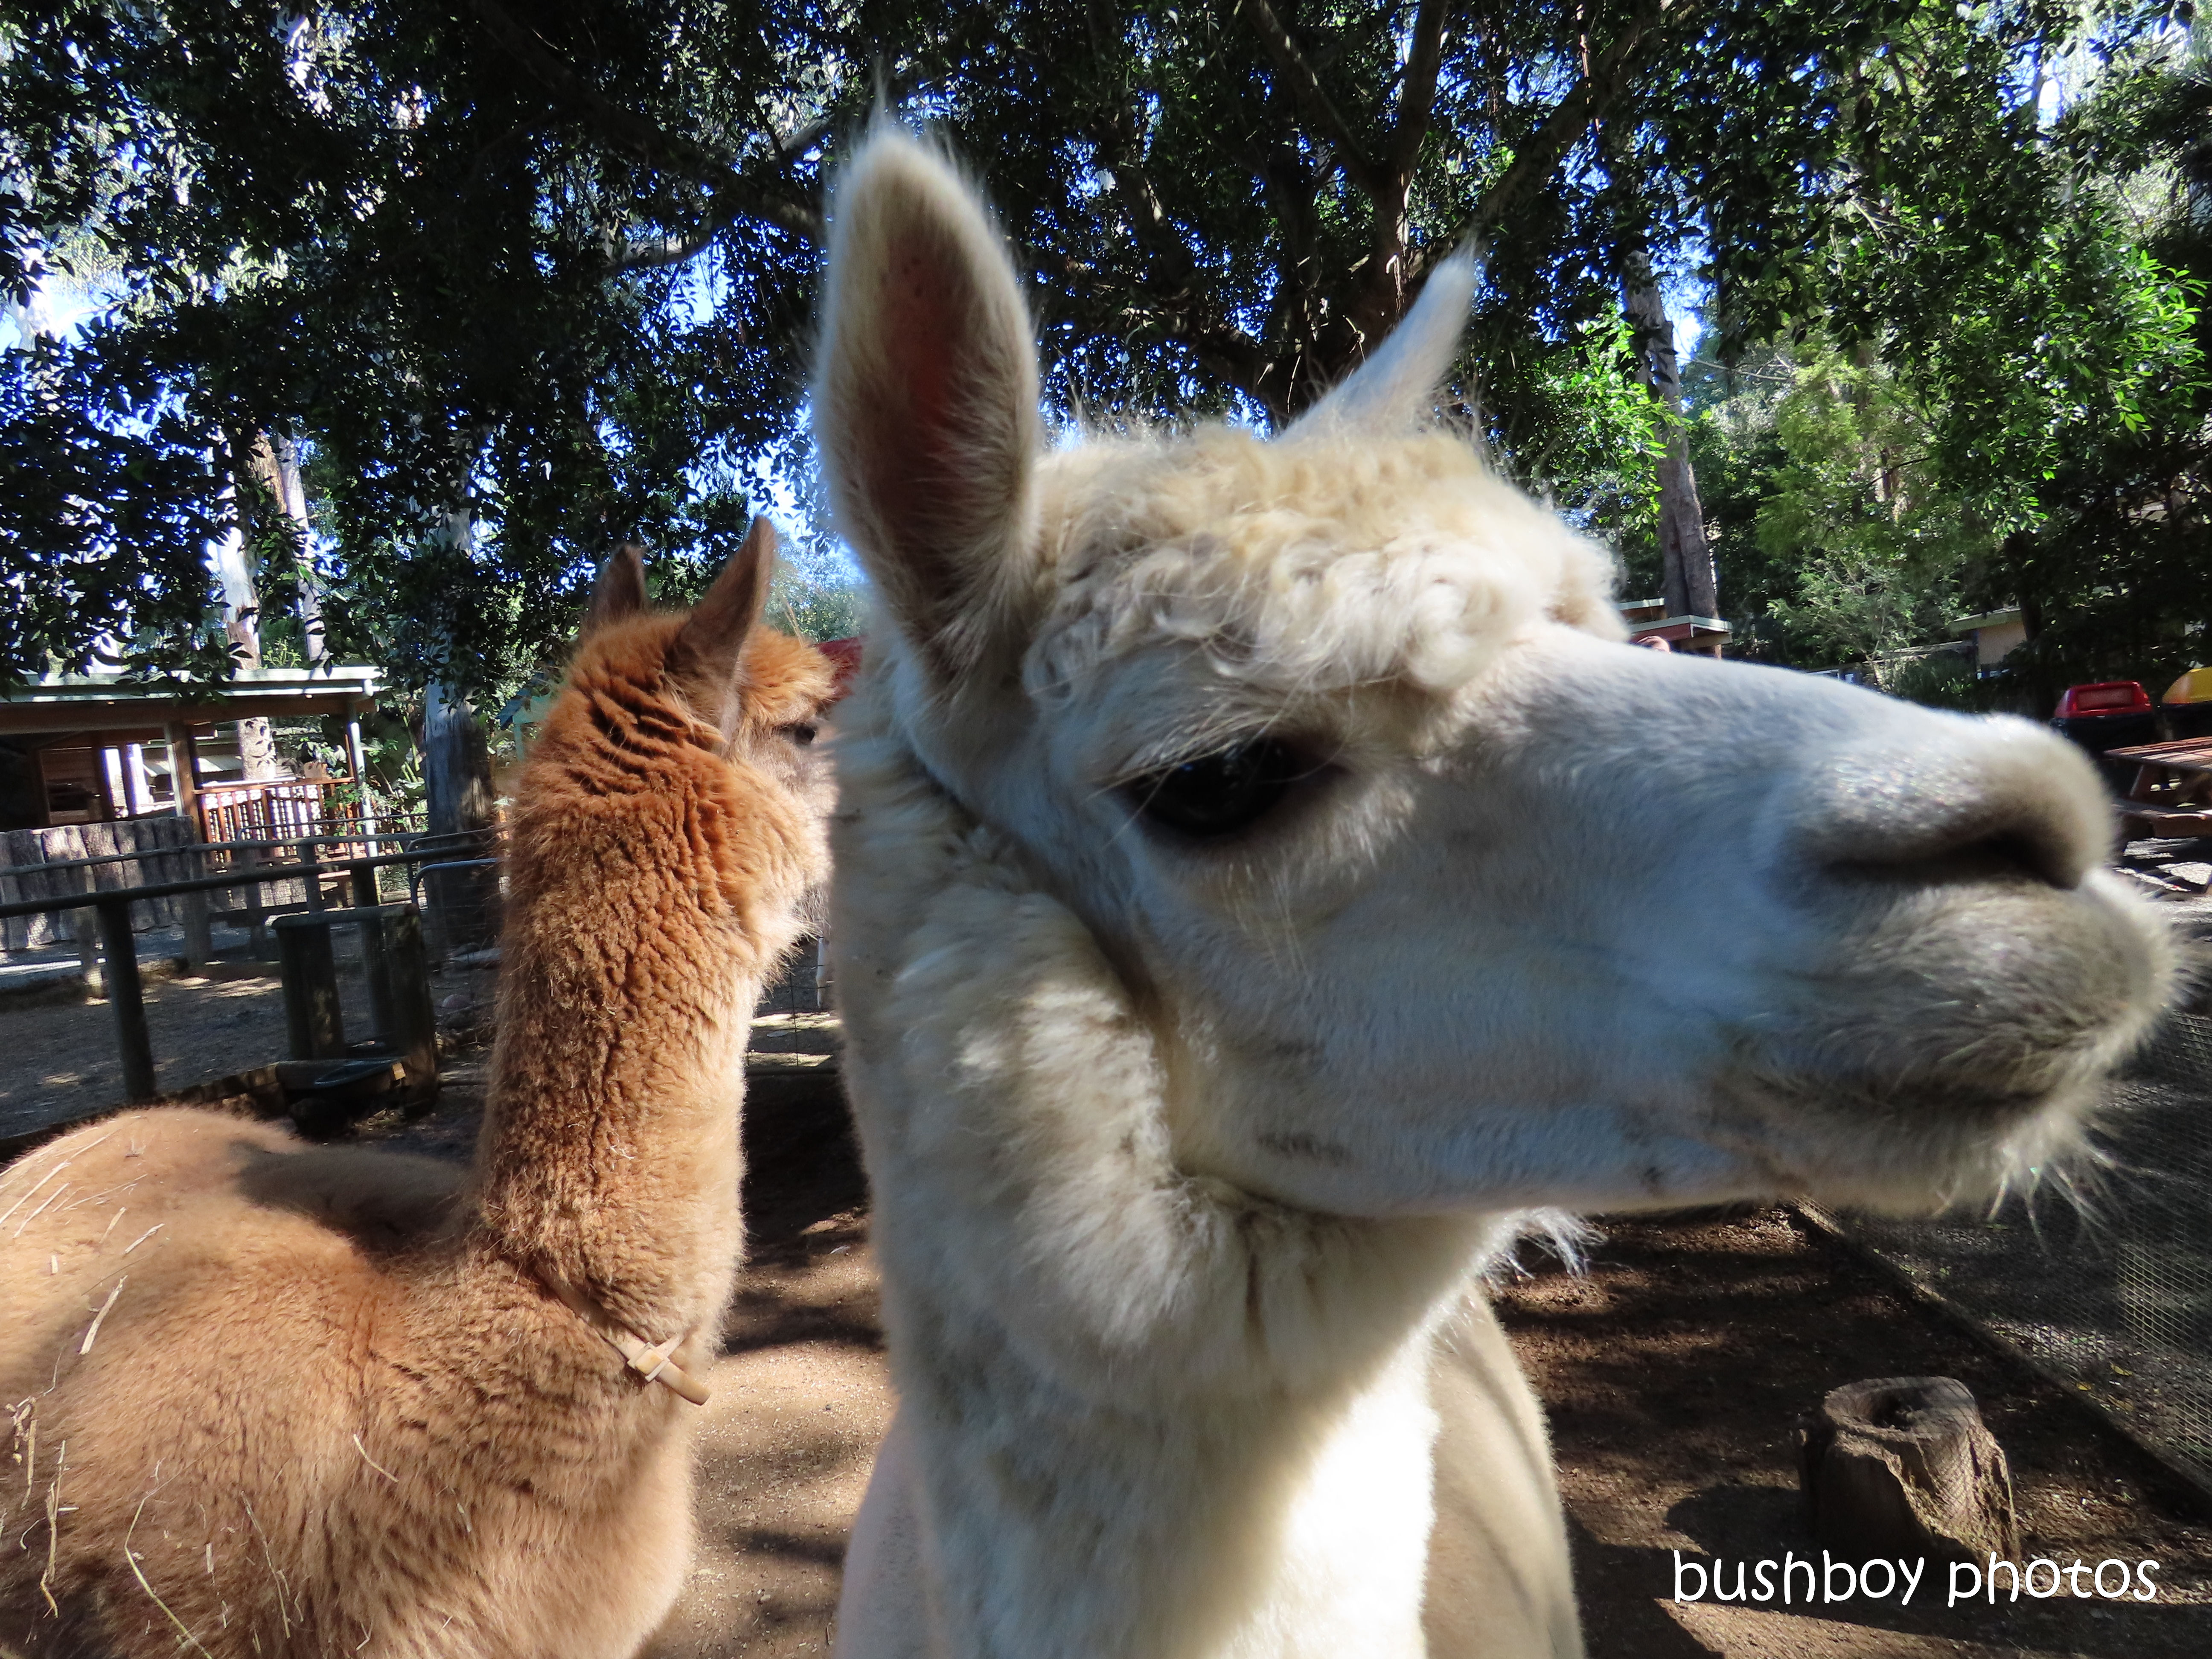 190619_blog_challenge_two_llamas